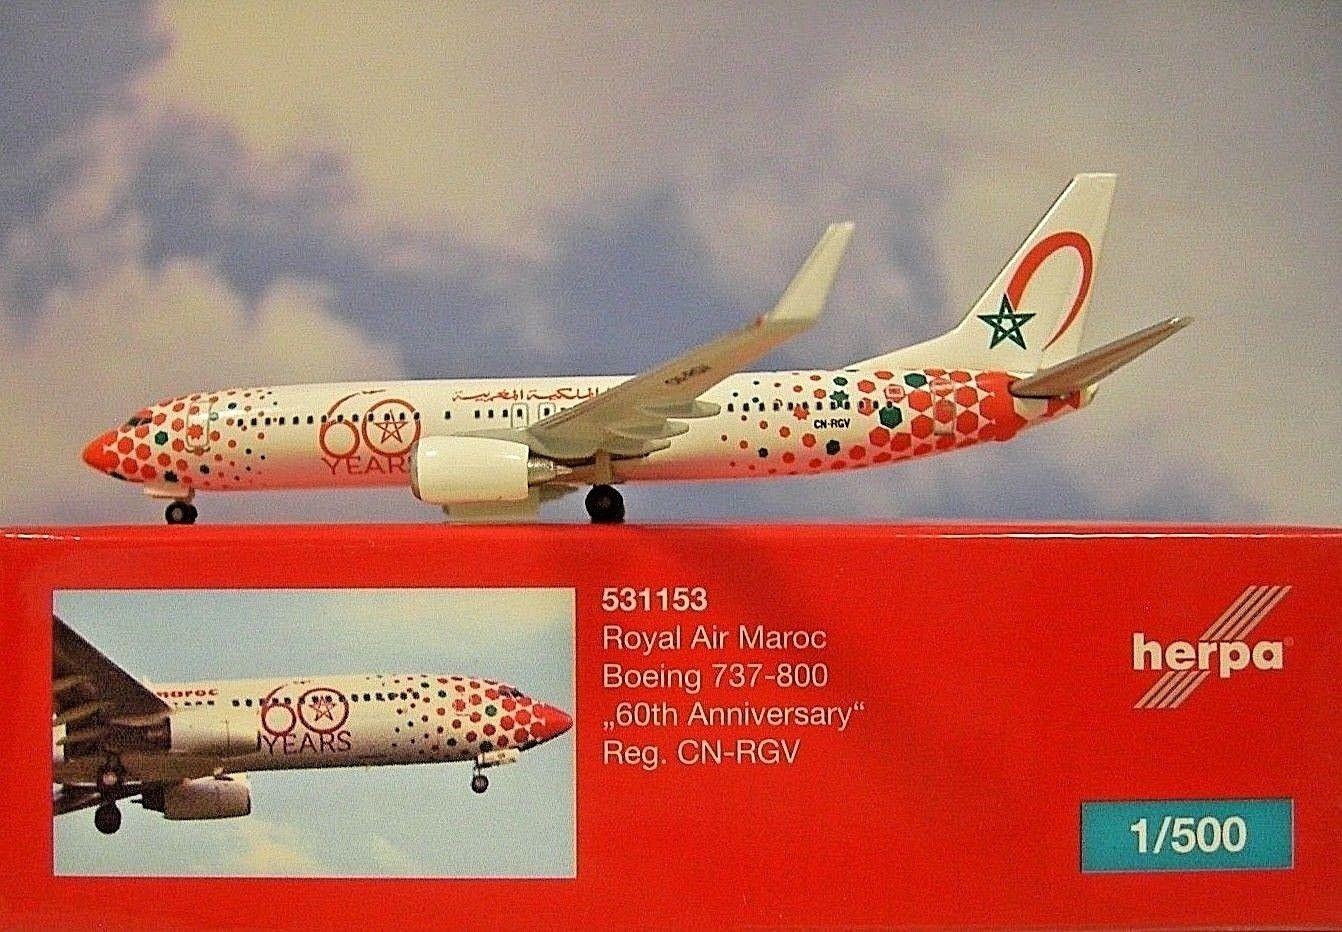 - 1/500 Royal Air Maroc '60th Anniversary' CN-RGV £35.00